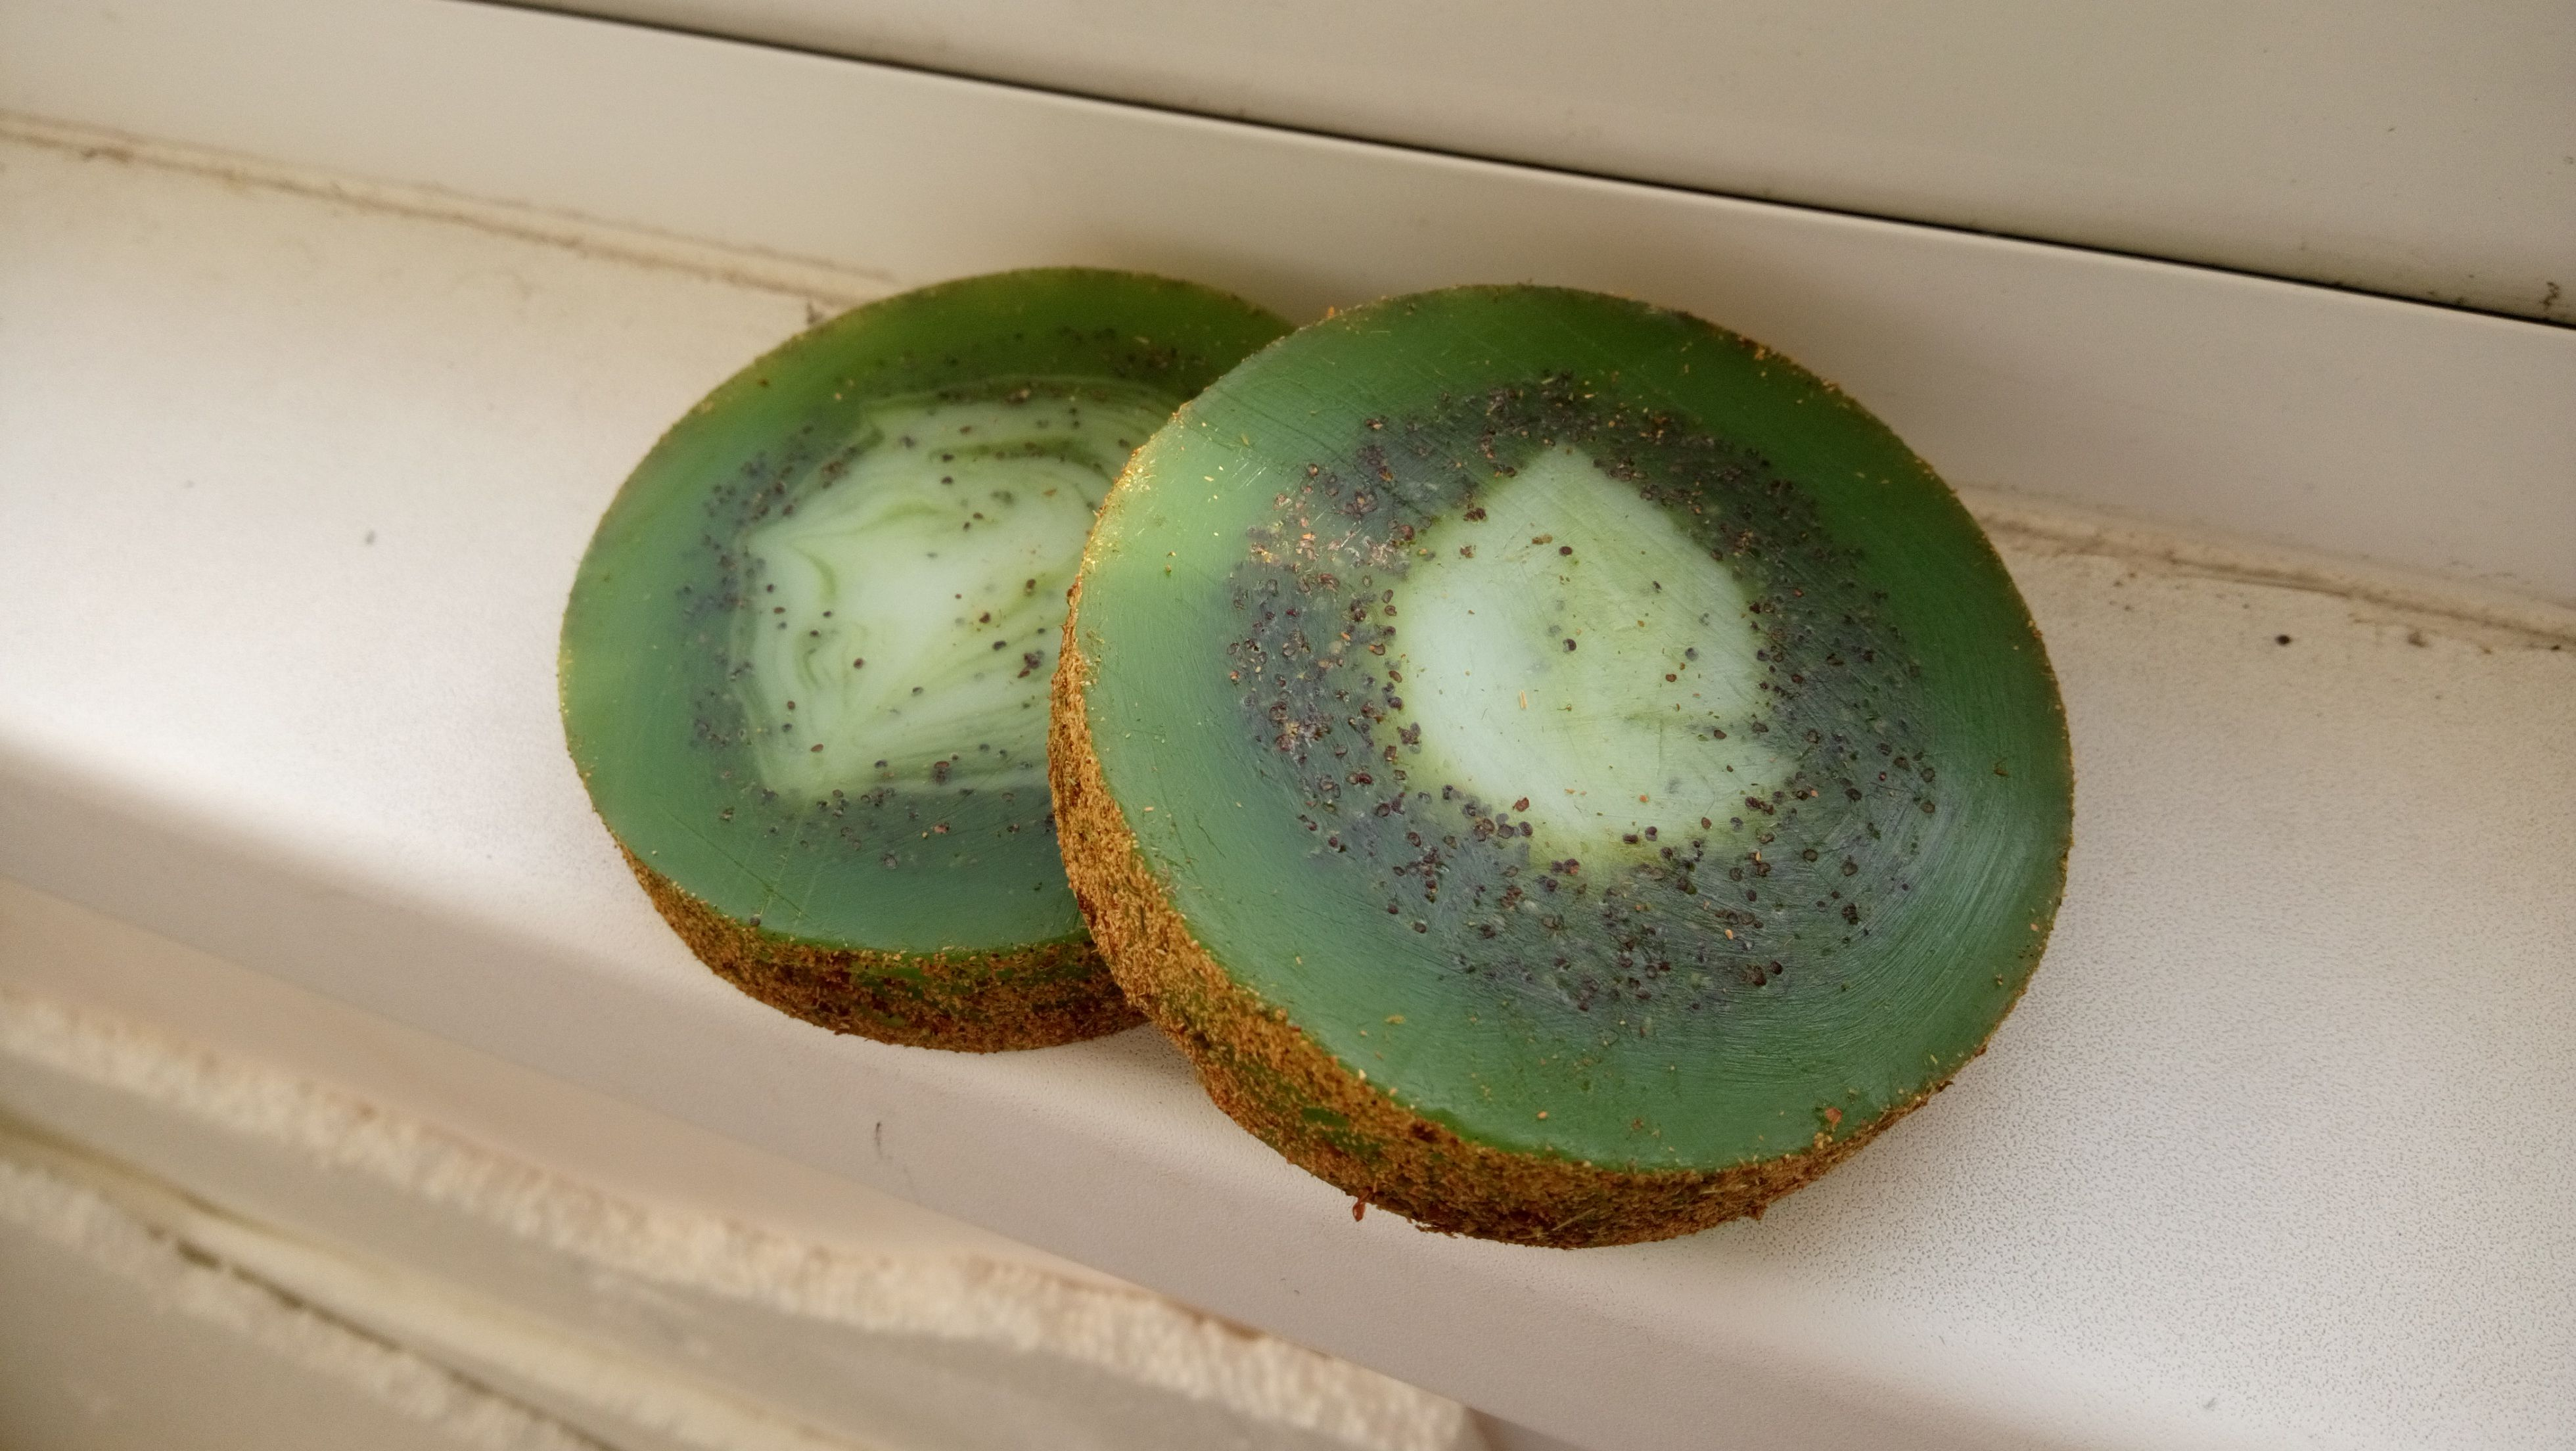 зелёный мыло пахнет киви травы натуральное вкусно фрукты